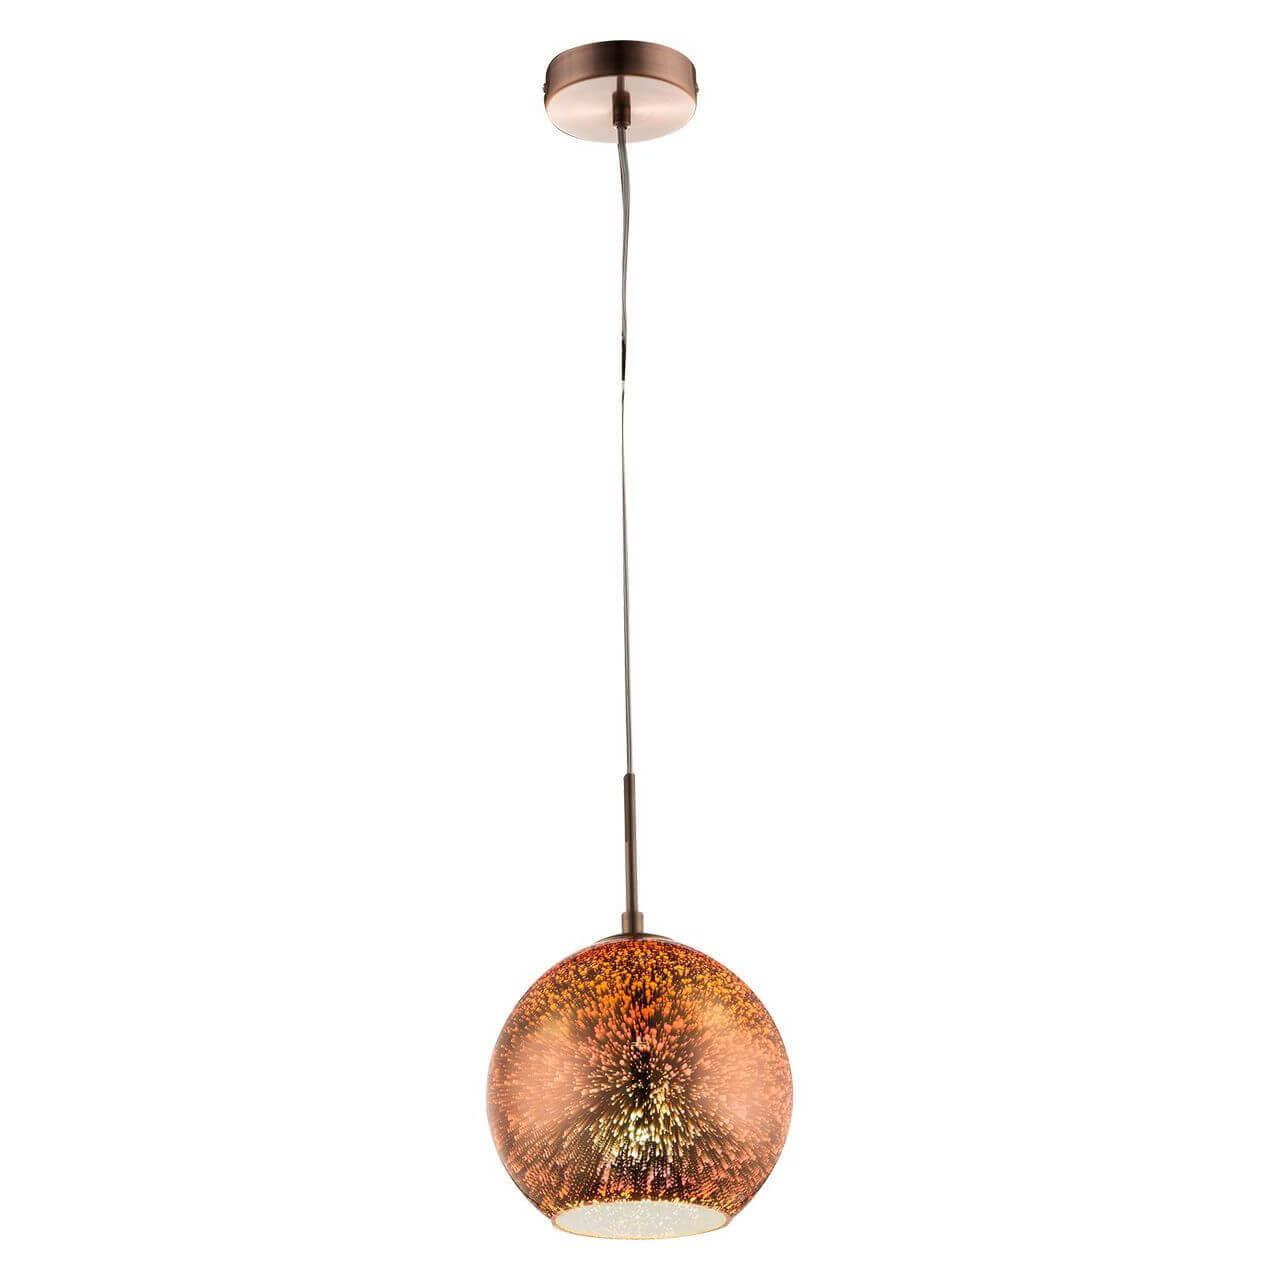 Подвесной светильник Globo Koby 15846 цена и фото